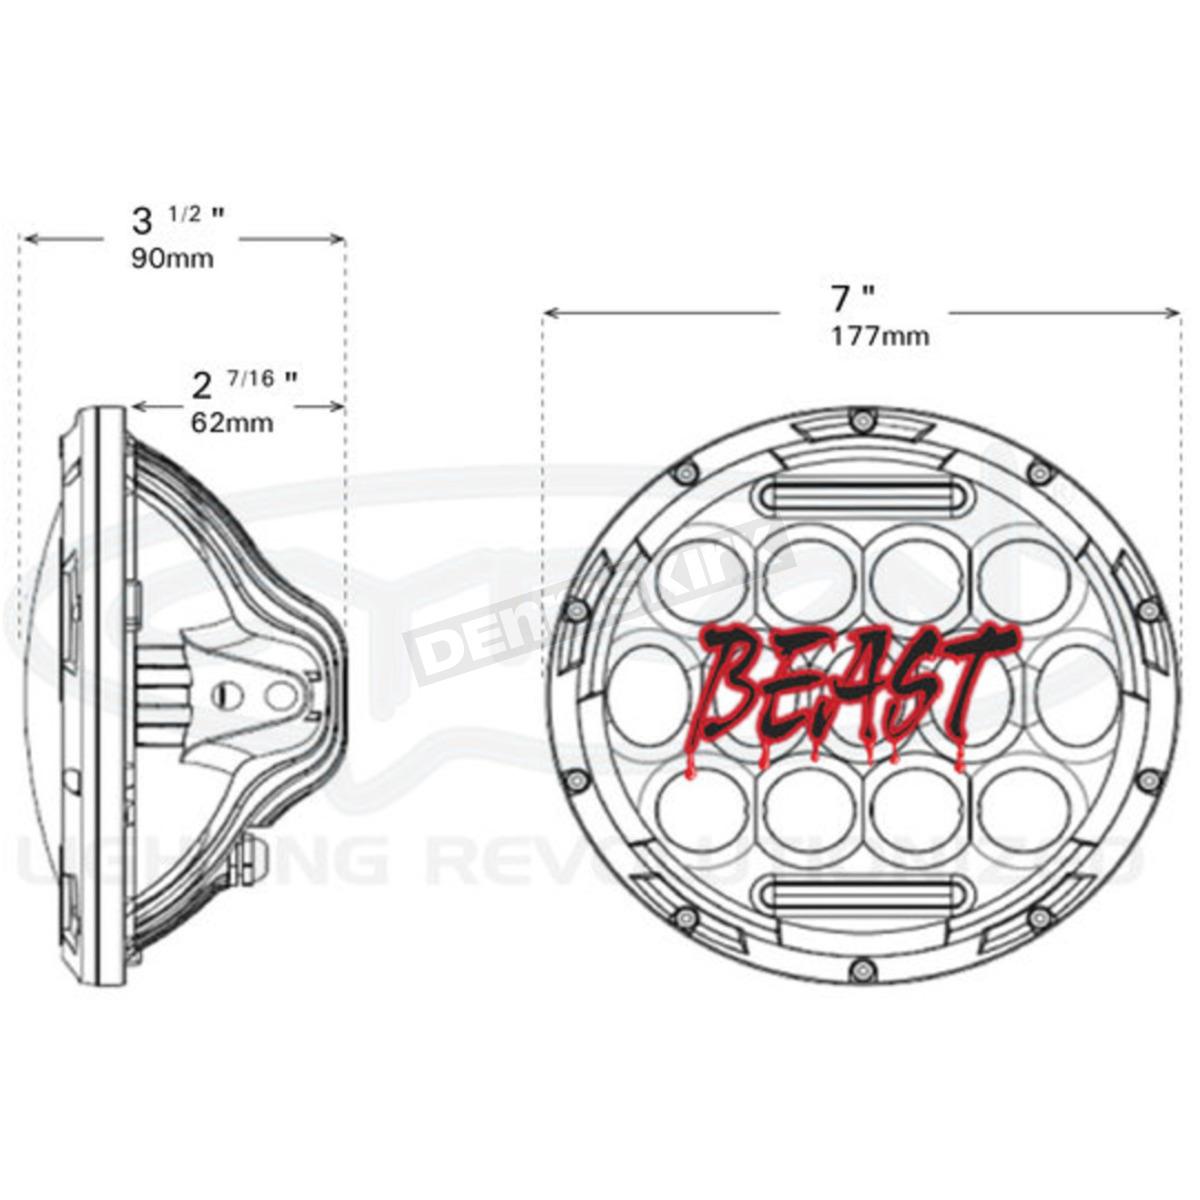 Cyron Black 7 In Beast Led Headlight